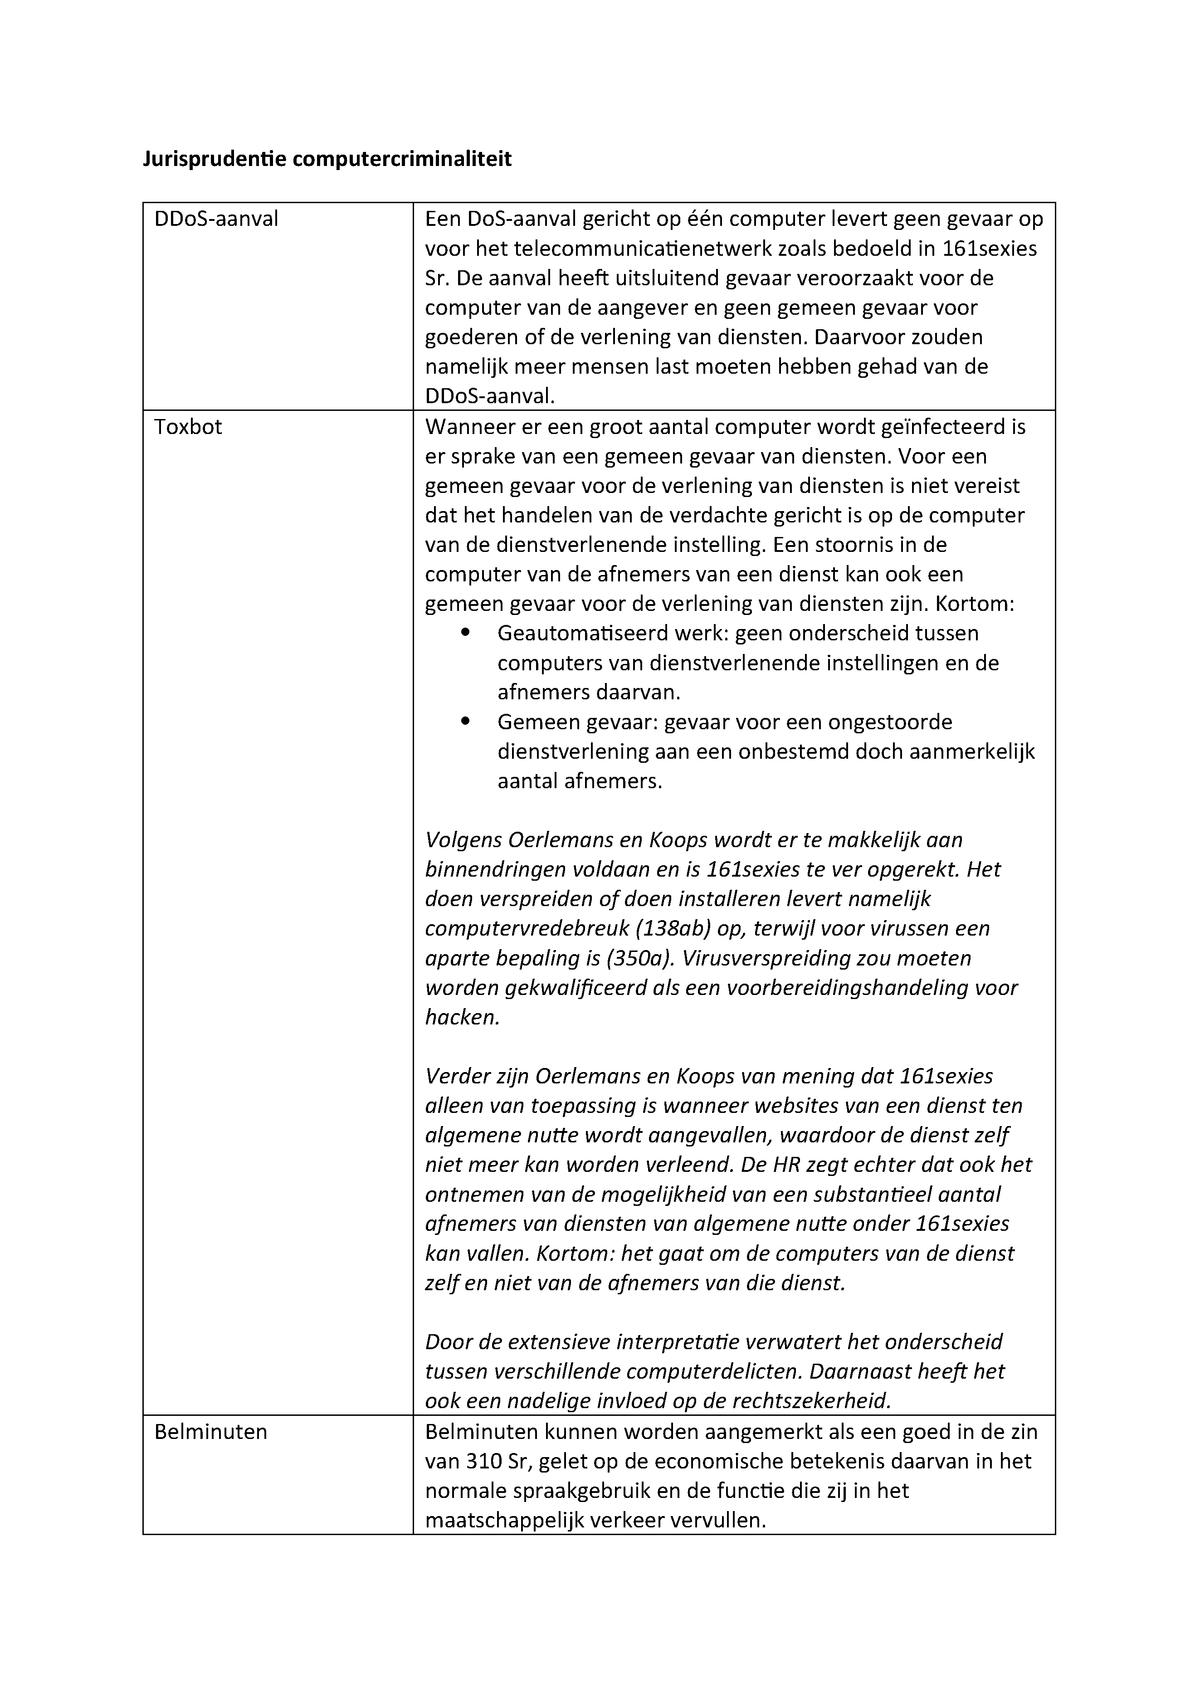 Jurisprudentie computercriminaliteit - StudeerSnel